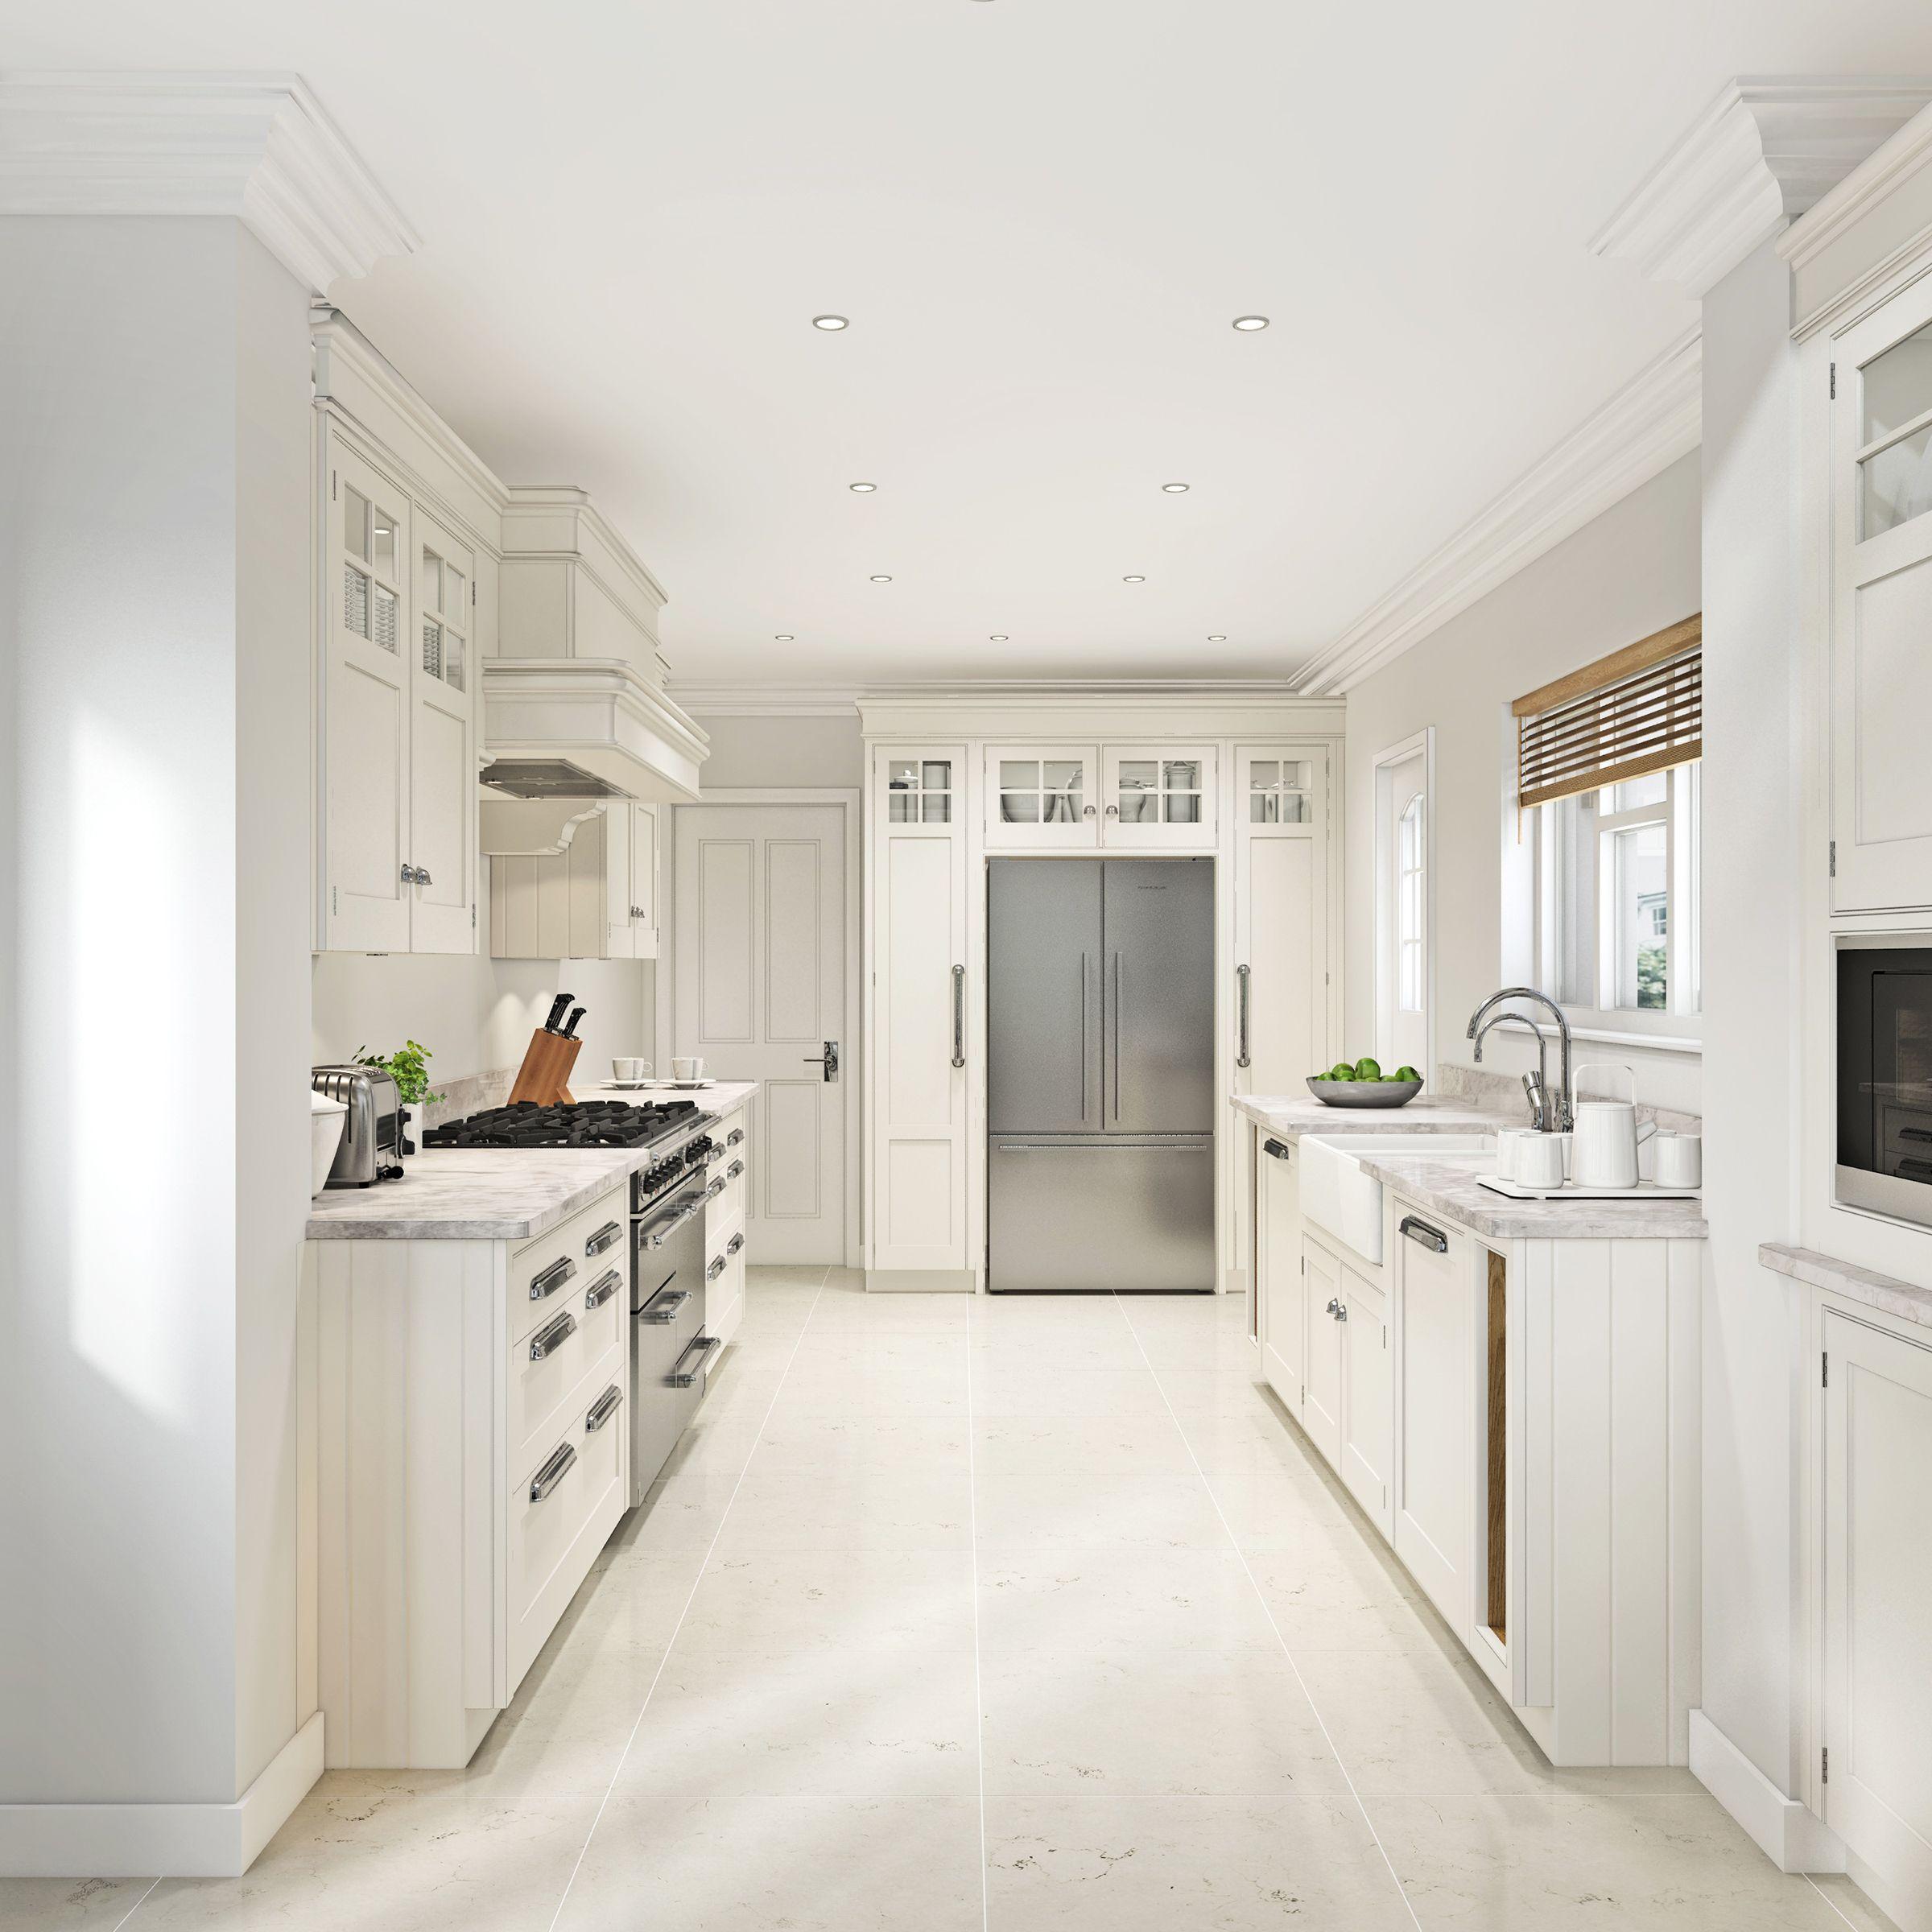 Mark Wilkinson New England Kitchen, CGI